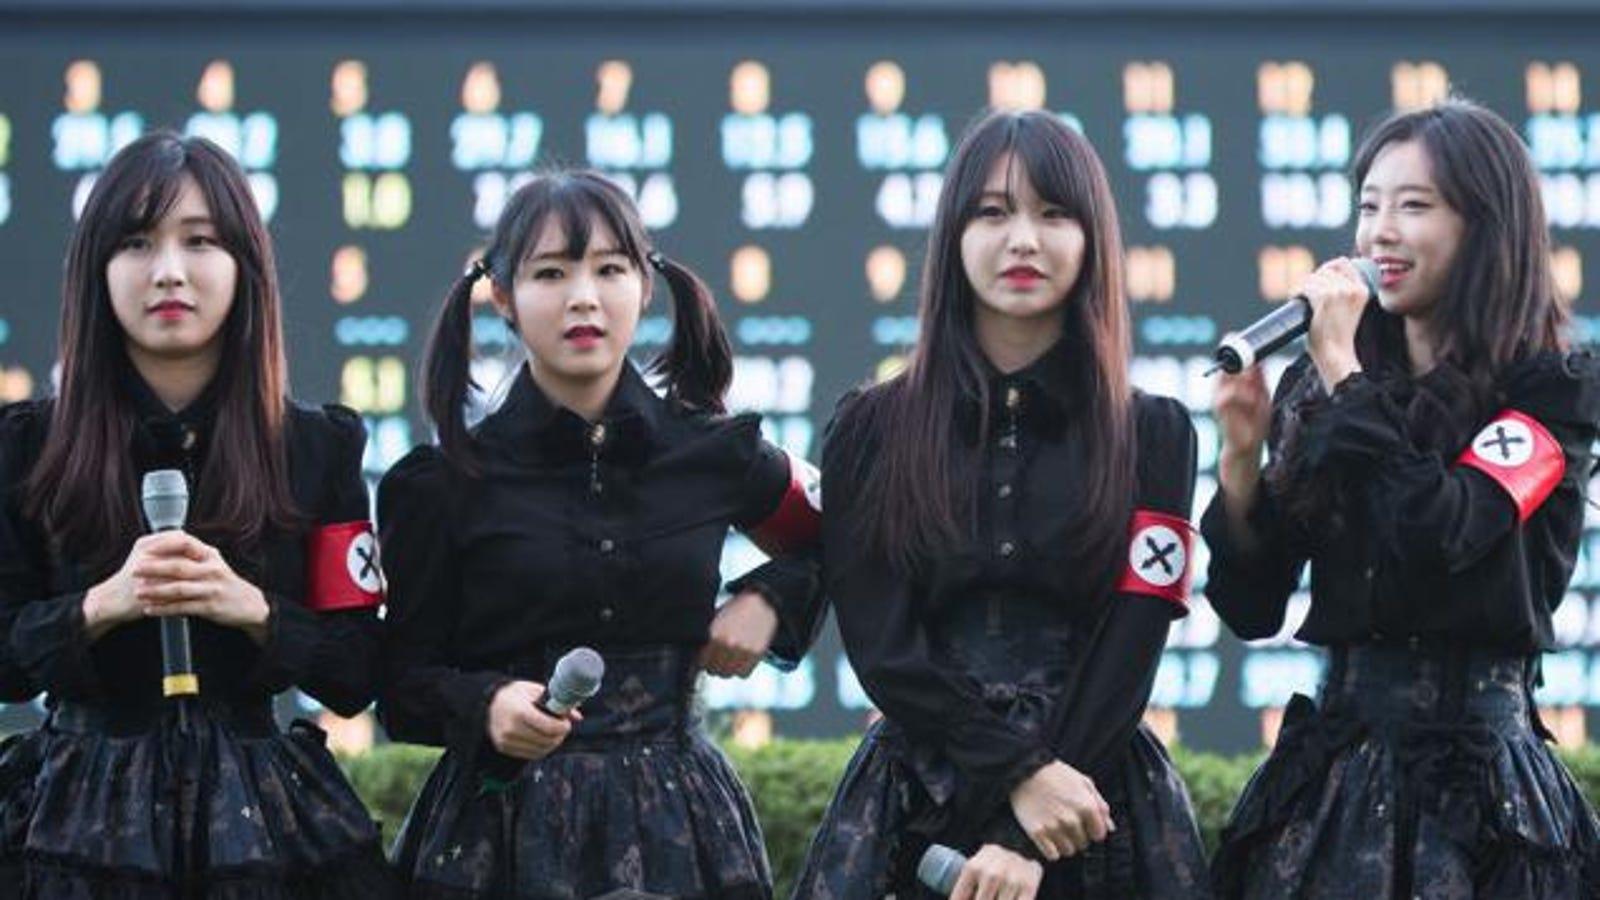 K-pop Group Wears Nazi-Like Uniforms, Controversy Ensues [Update]